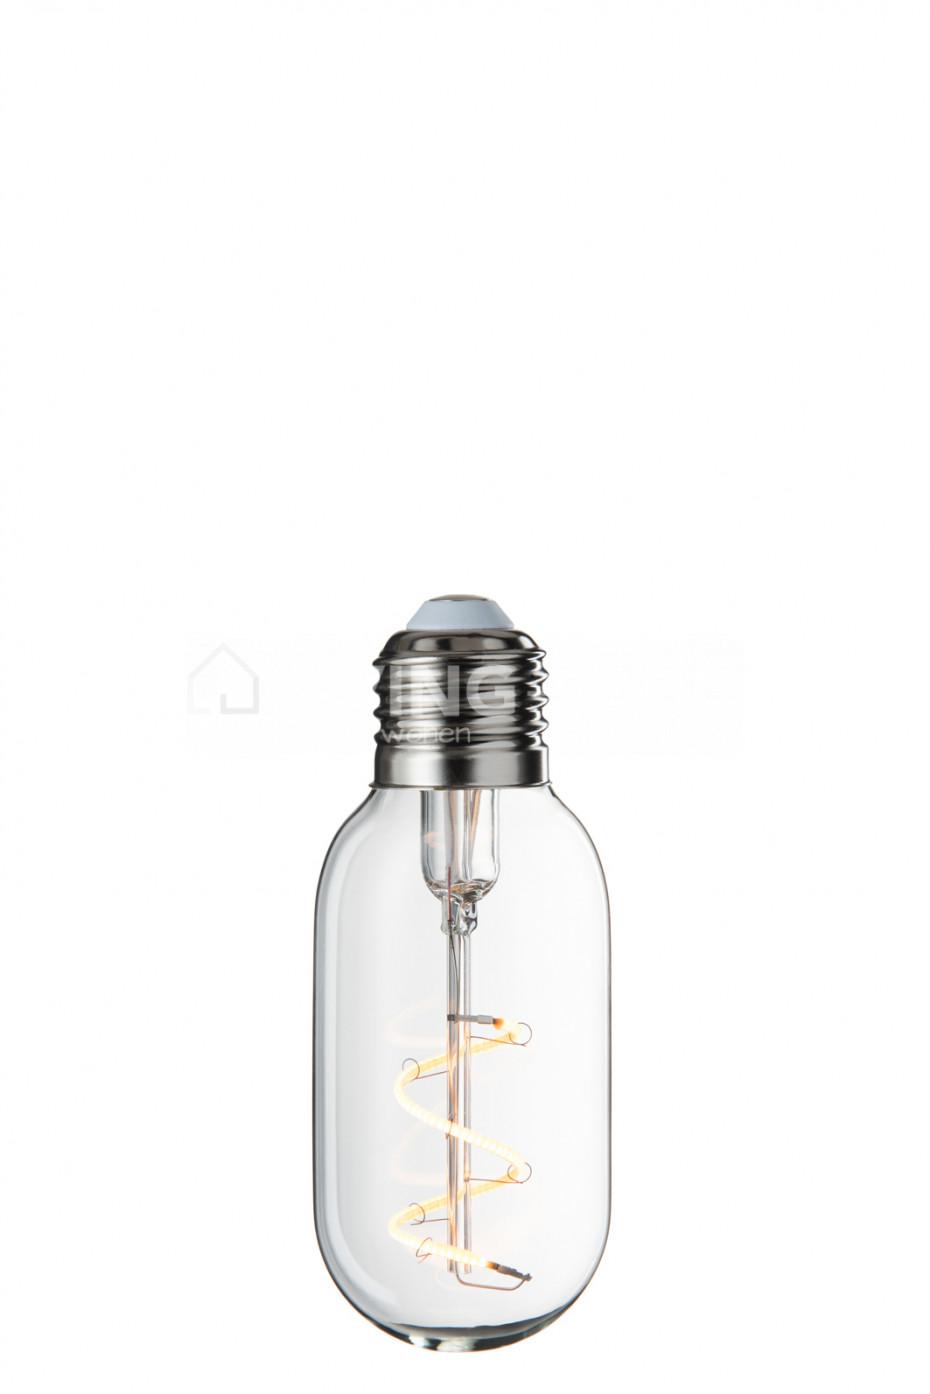 Retro Led Lamps Spiral E27 Lampe Led T45 Dimmable Living Shop